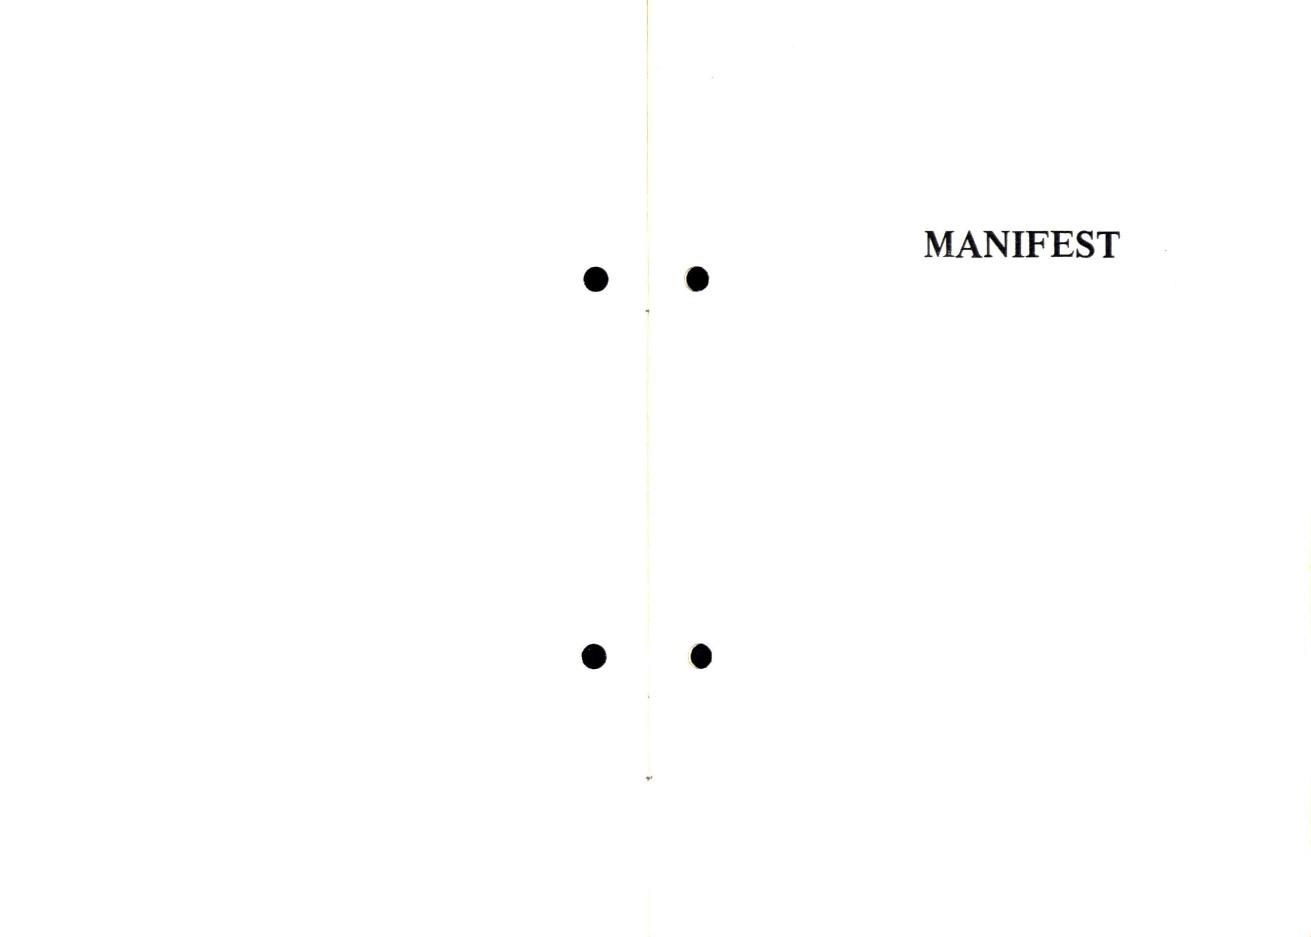 VSK_1974_Manifest_02